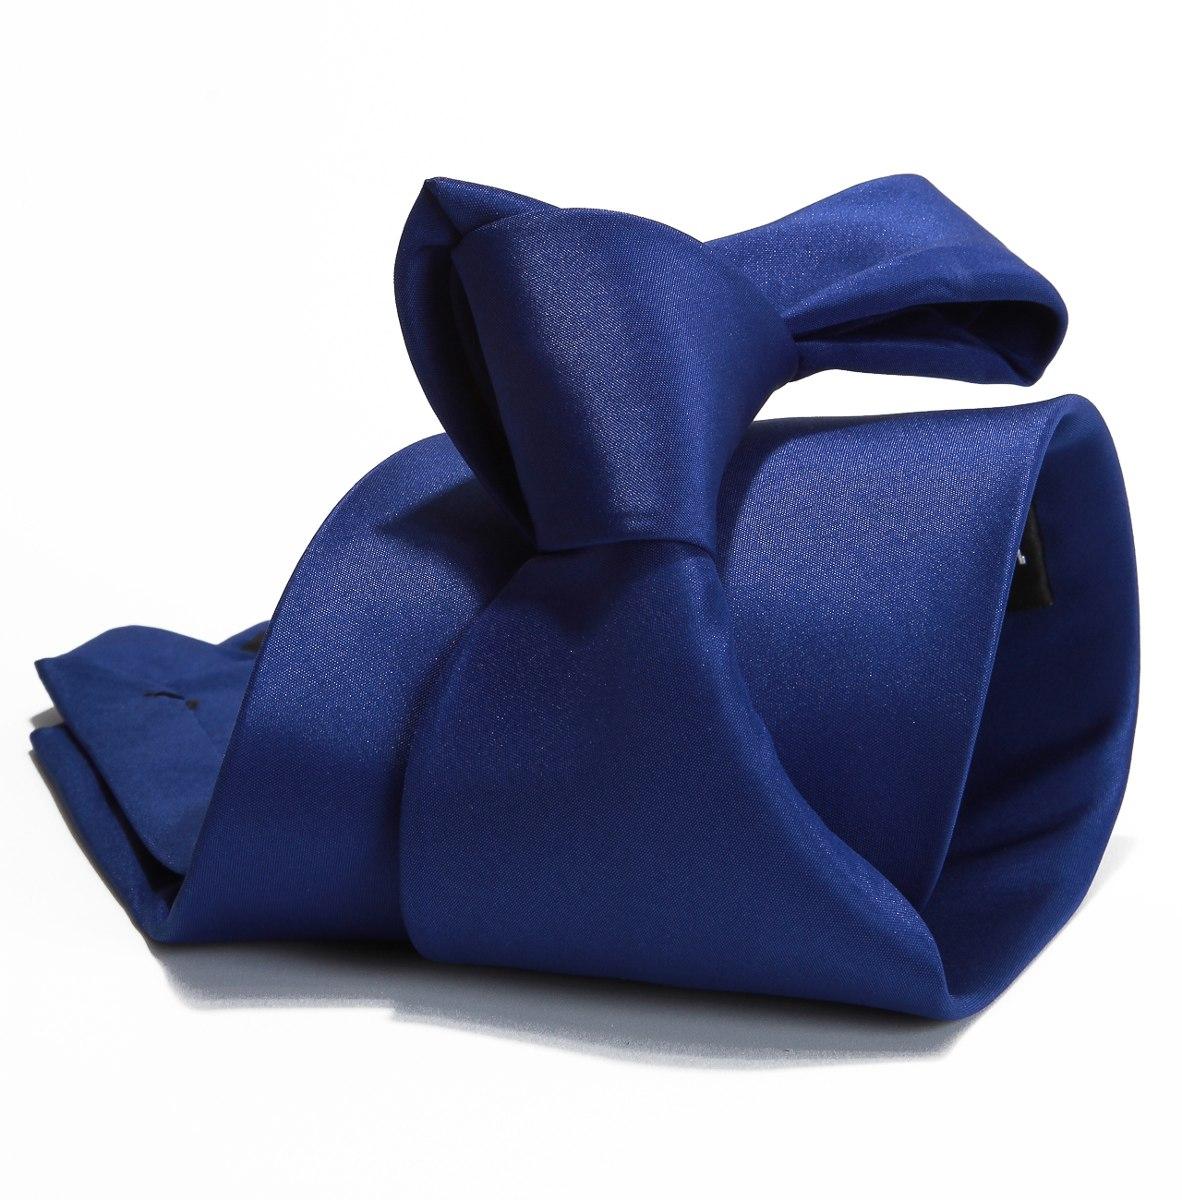 10 Gravata Azul Royal Lisa Acetinada - R  120,00 em Mercado Livre 4402c7dd62